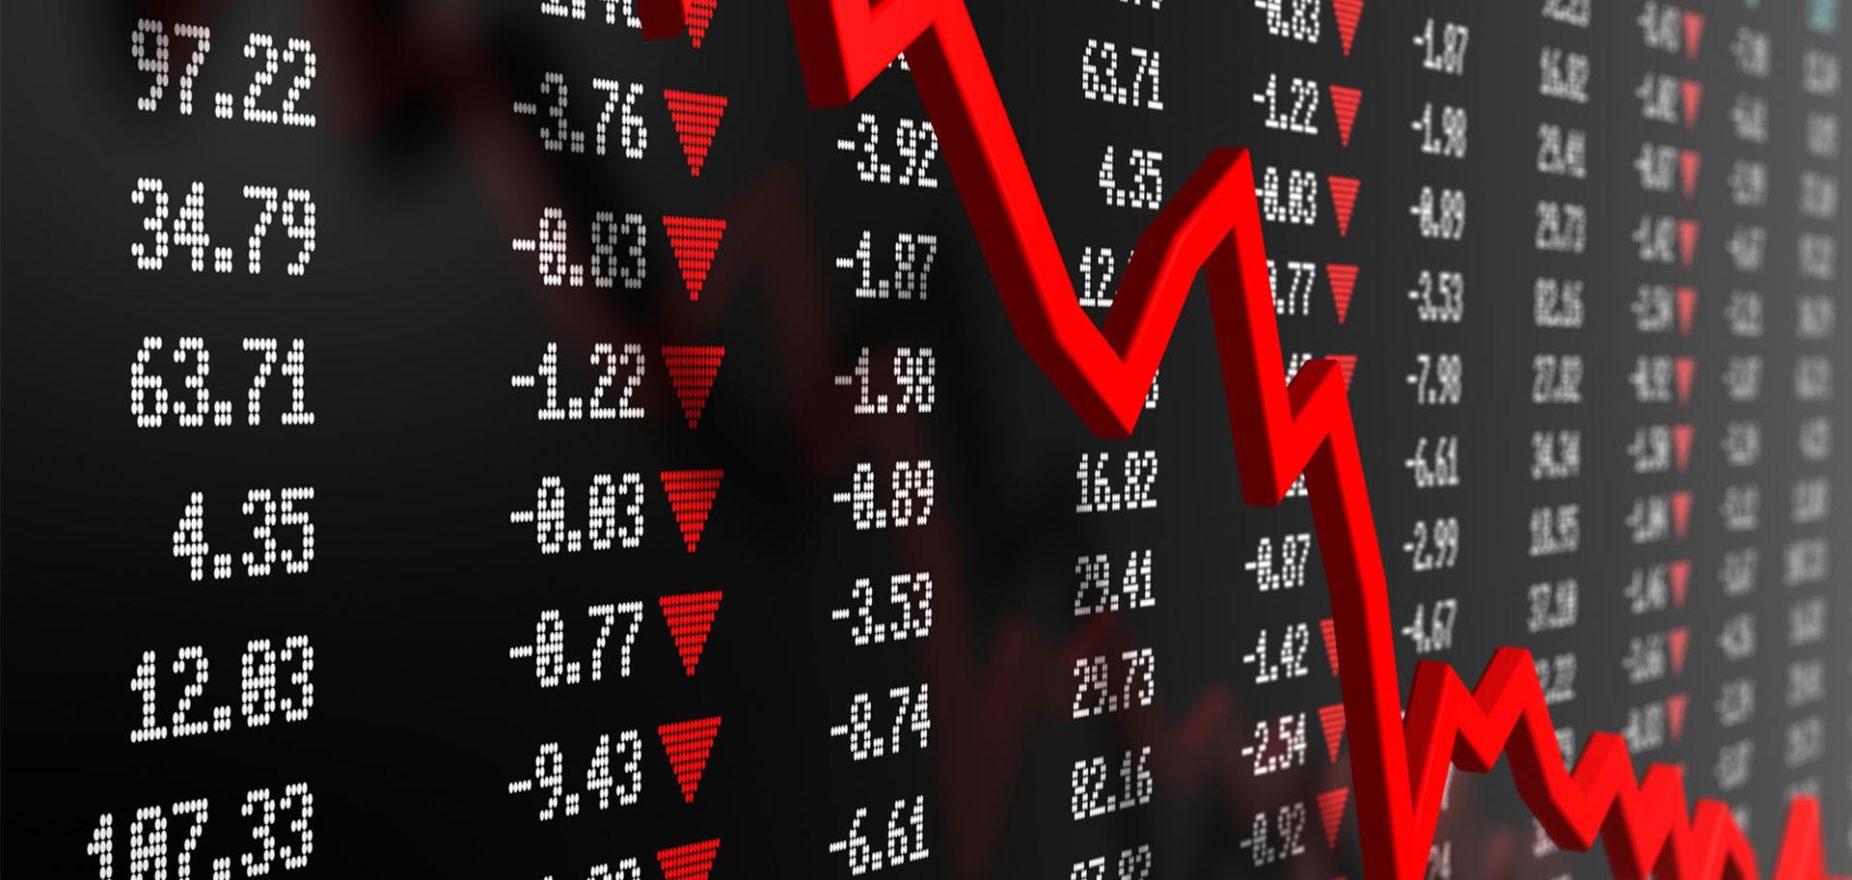 Nocoiner Financial Advisers Are Failing Their Clients